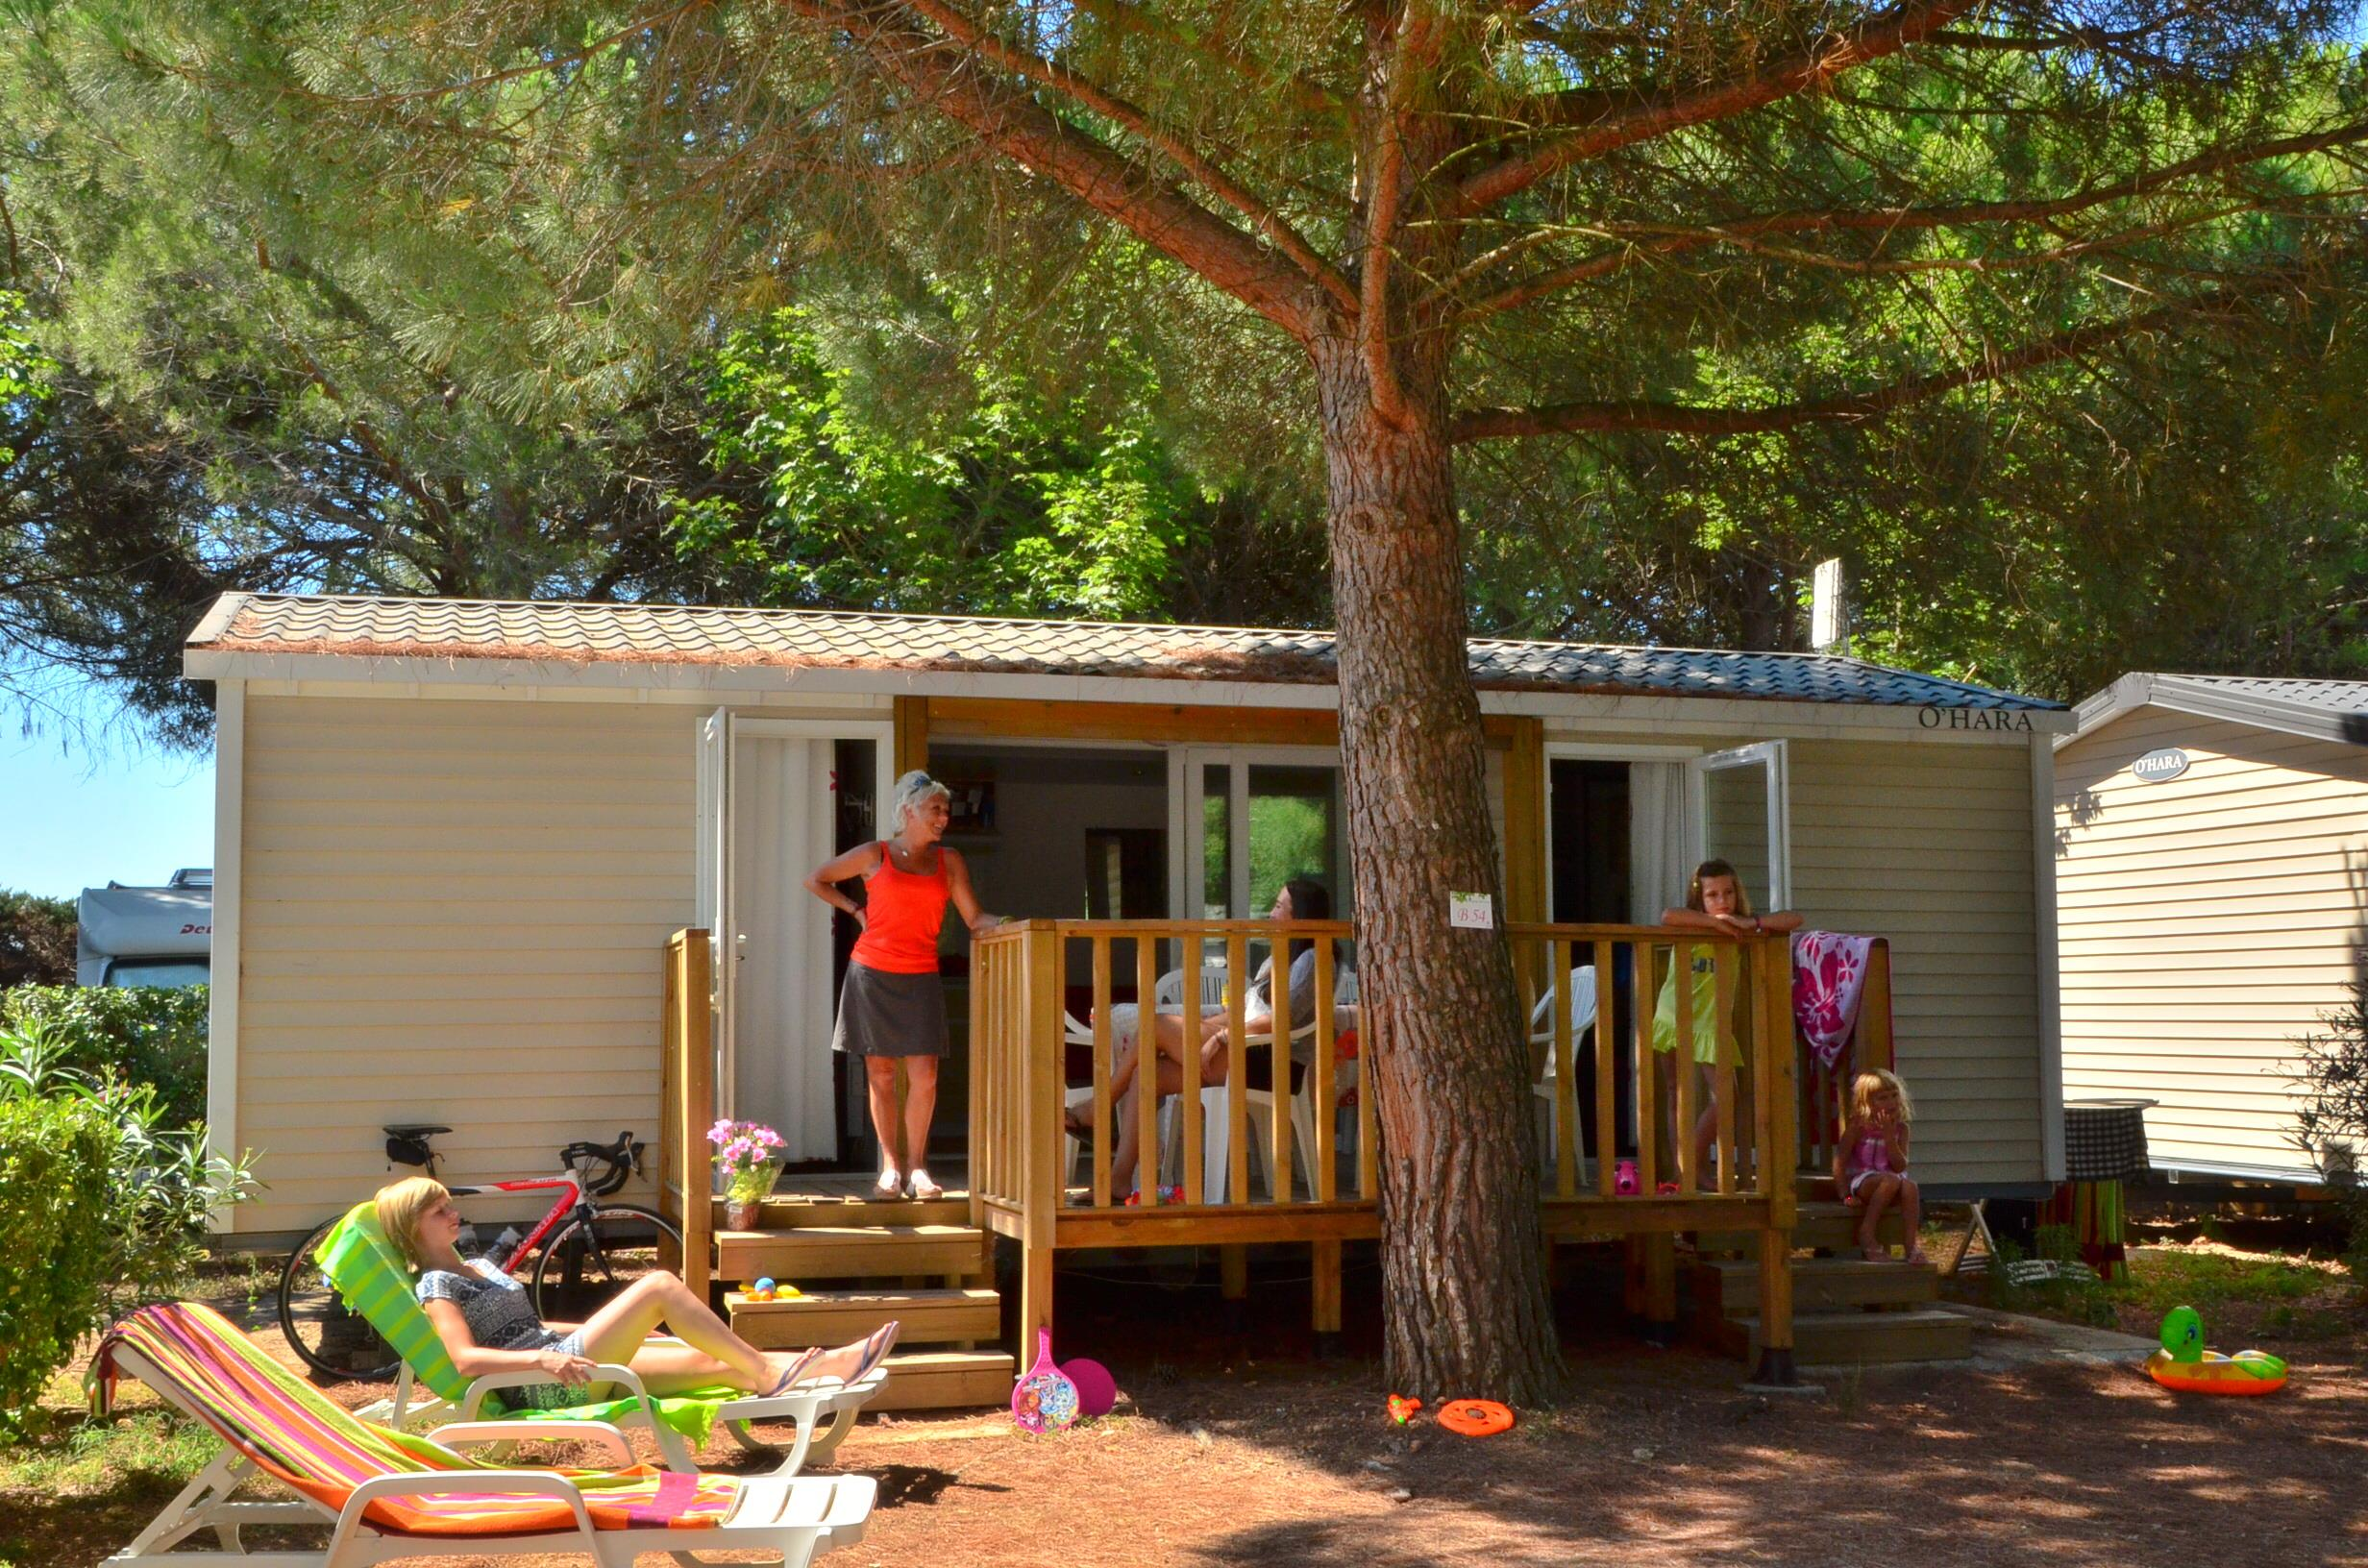 Location - Le Patio Climatise 2 Chambres 2 Salles De Bain - Camping Le Bon Port